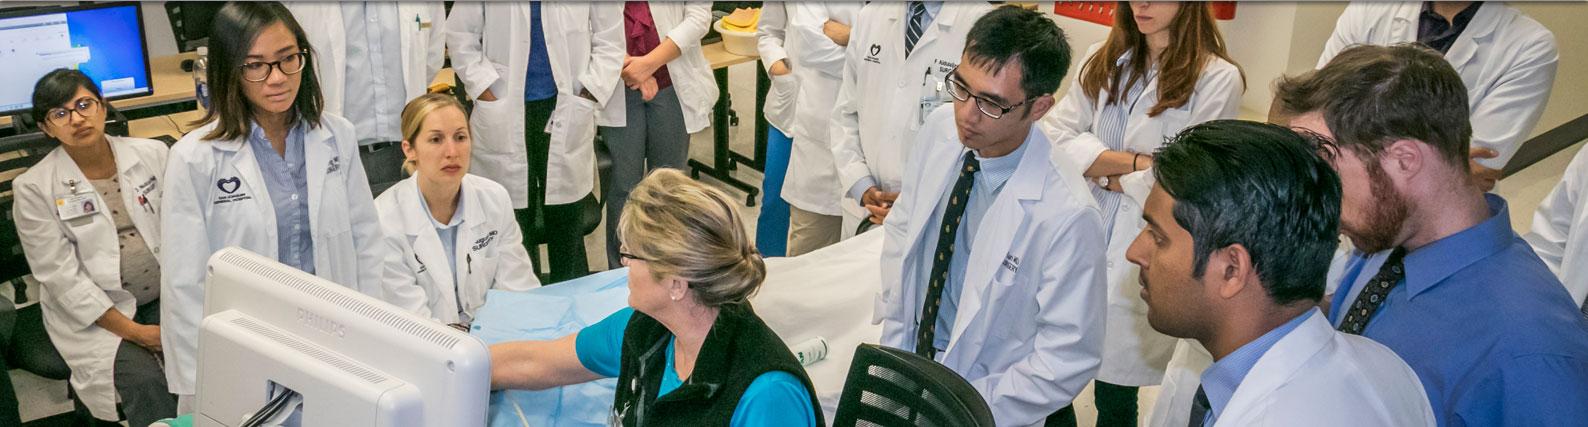 Graduate Medical Education | San Joaquin General Hospital